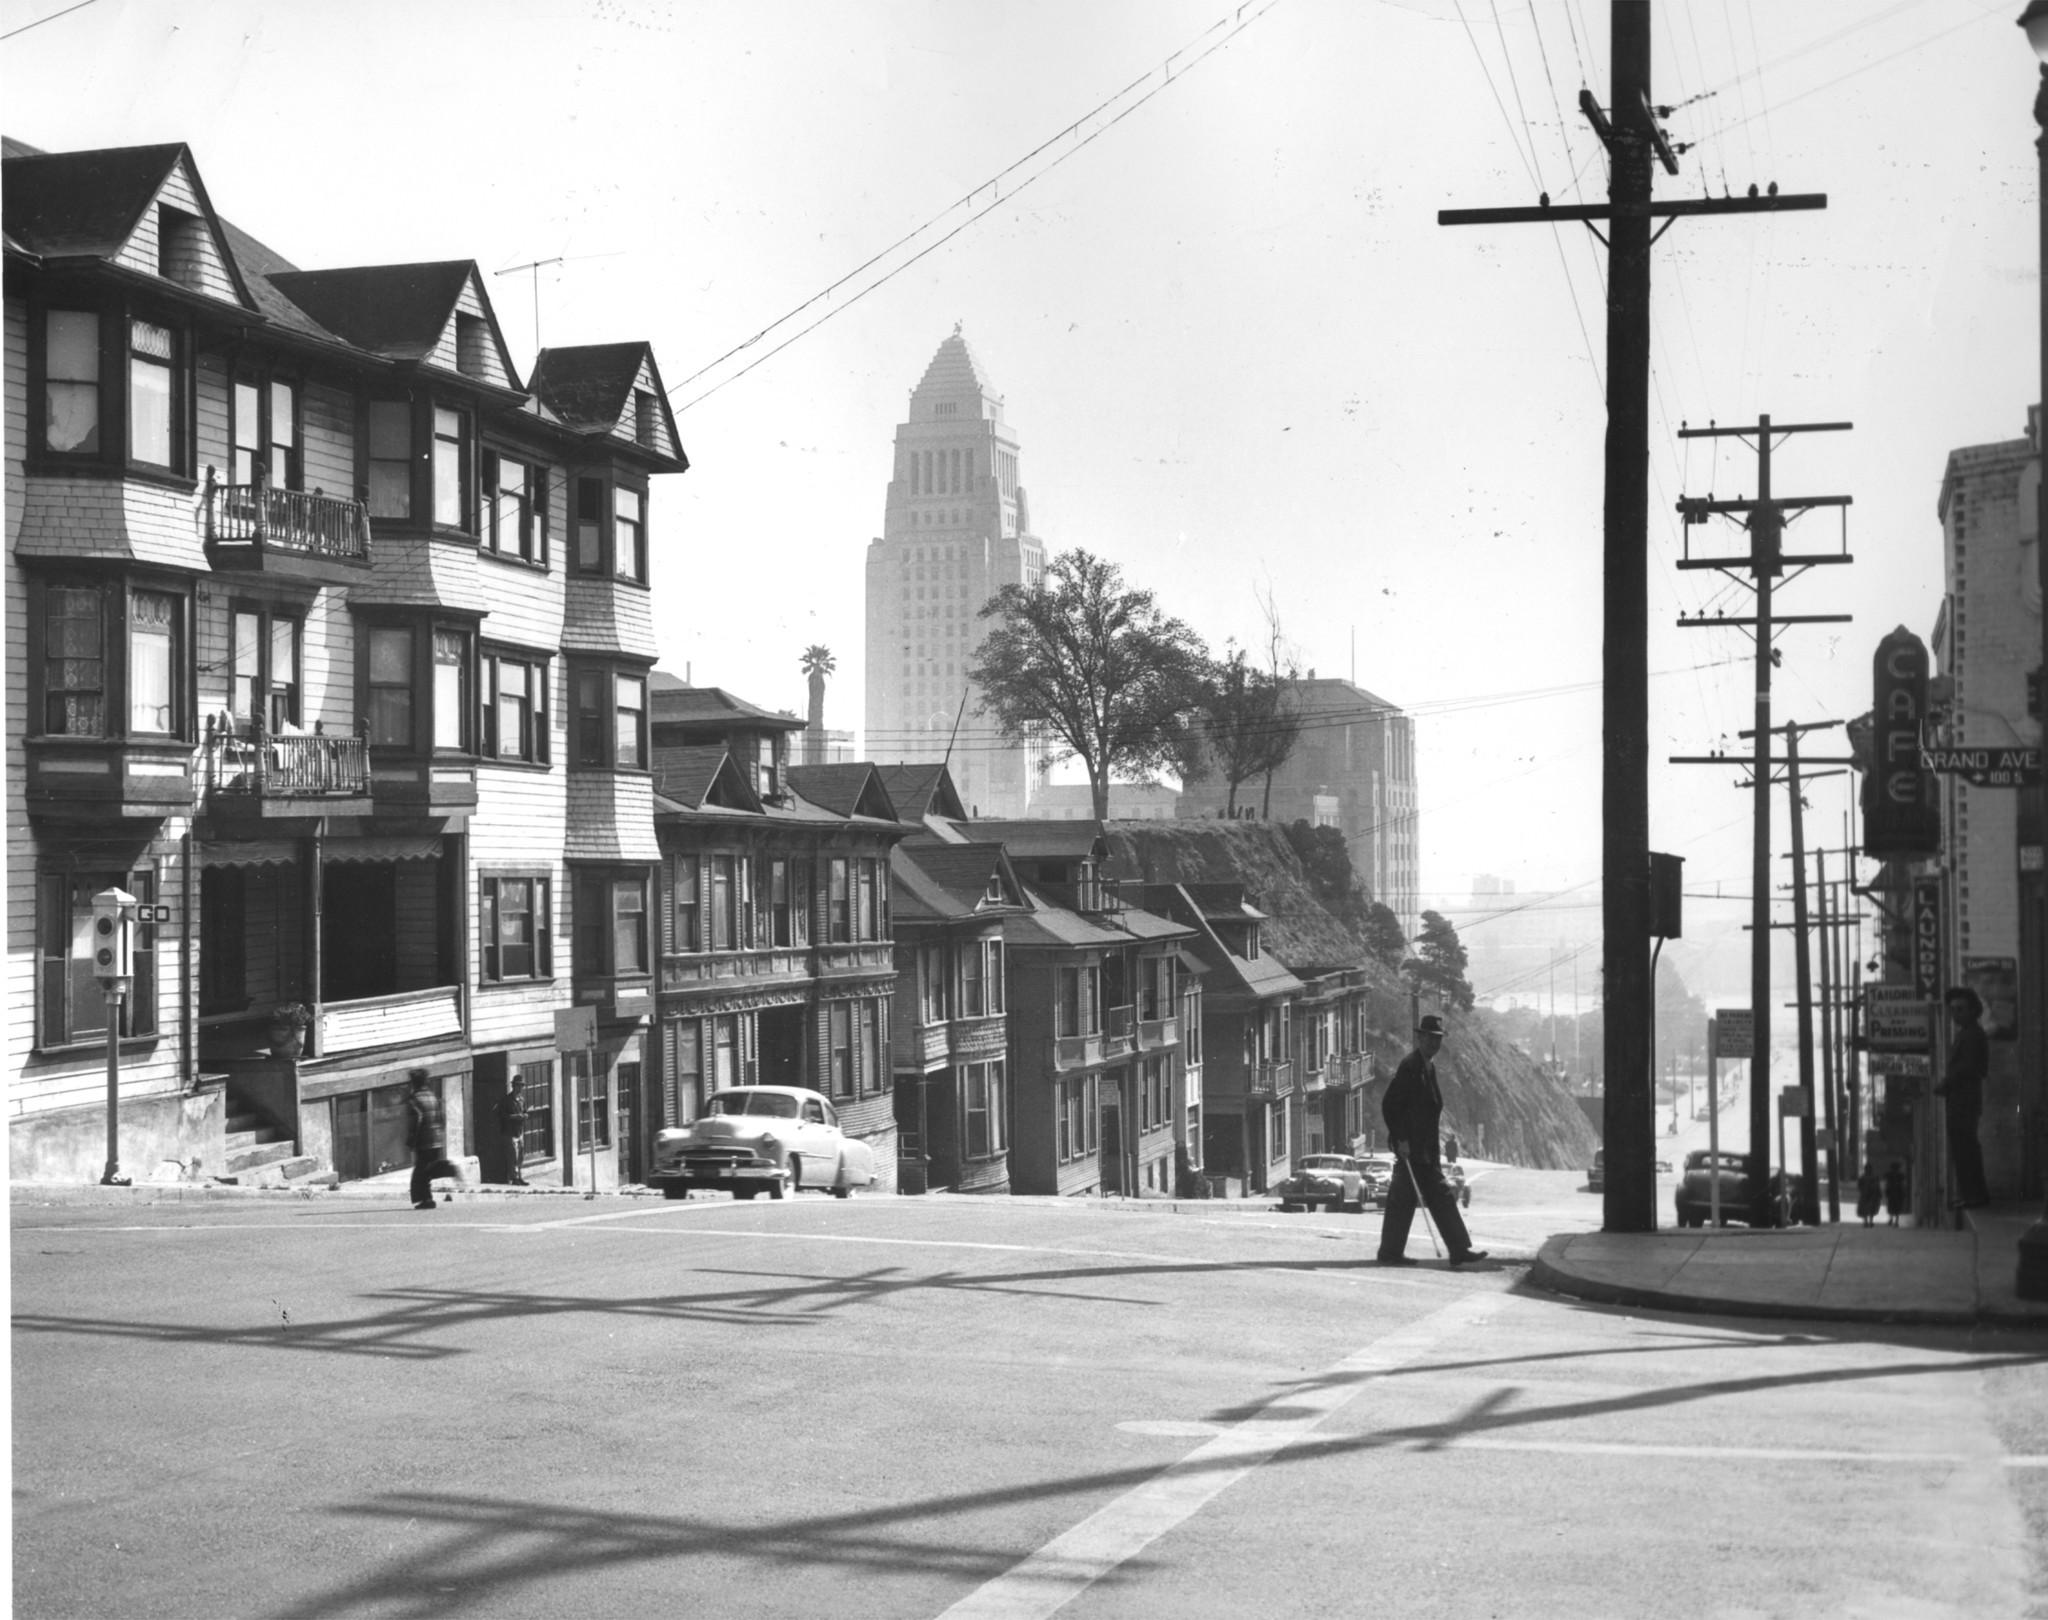 City Hall is seen beyond the Bunker Hill neighborhood in 1960.